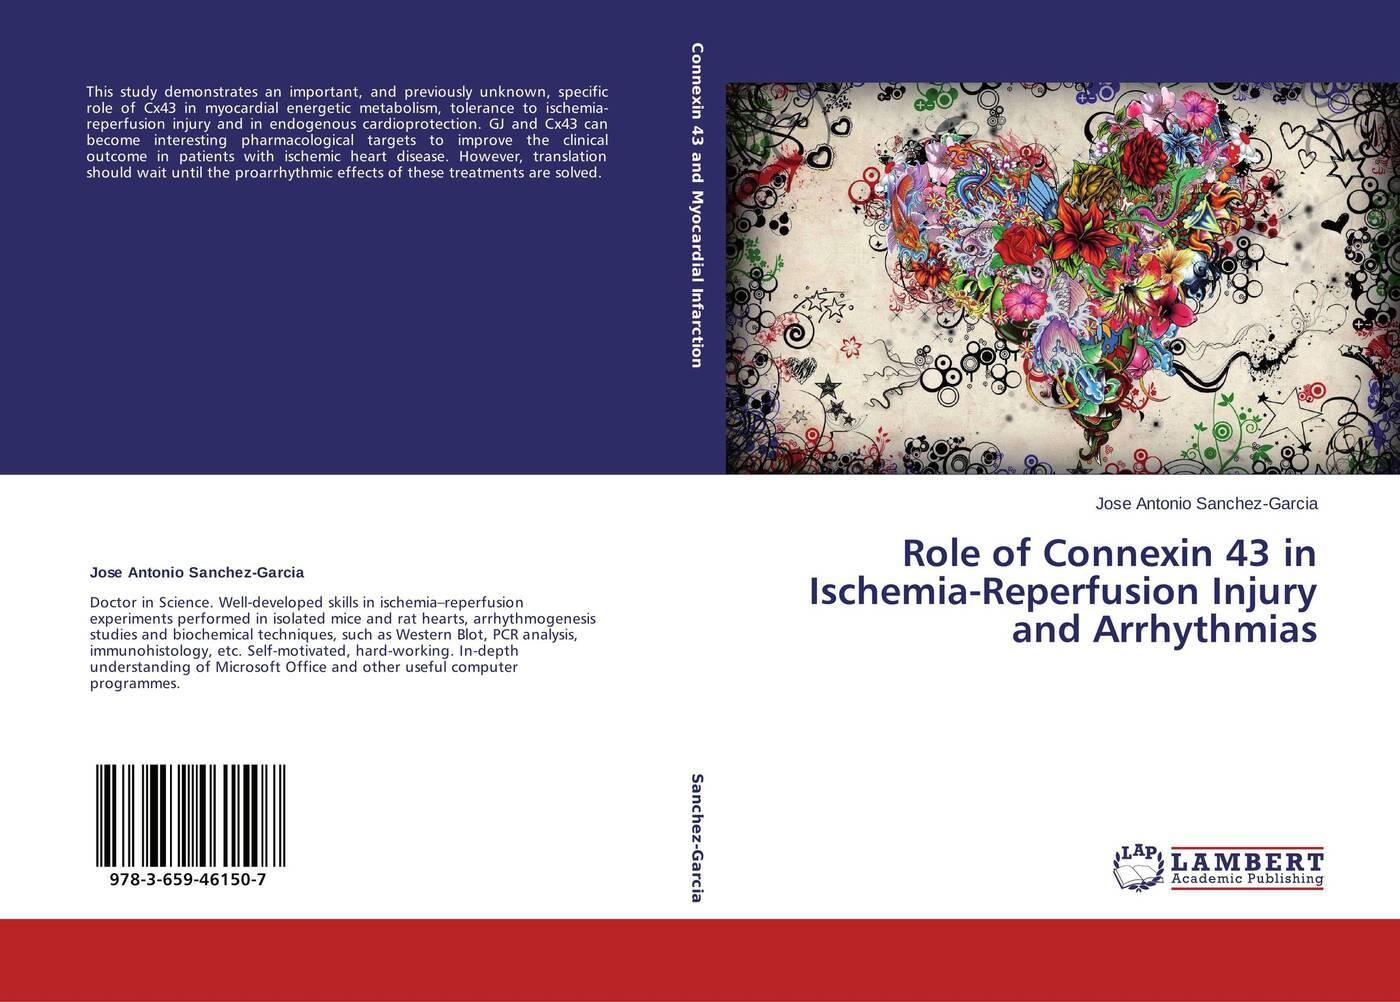 лучшая цена Jose Antonio Sanchez-Garcia Role of Connexin 43 in Ischemia-Reperfusion Injury and Arrhythmias